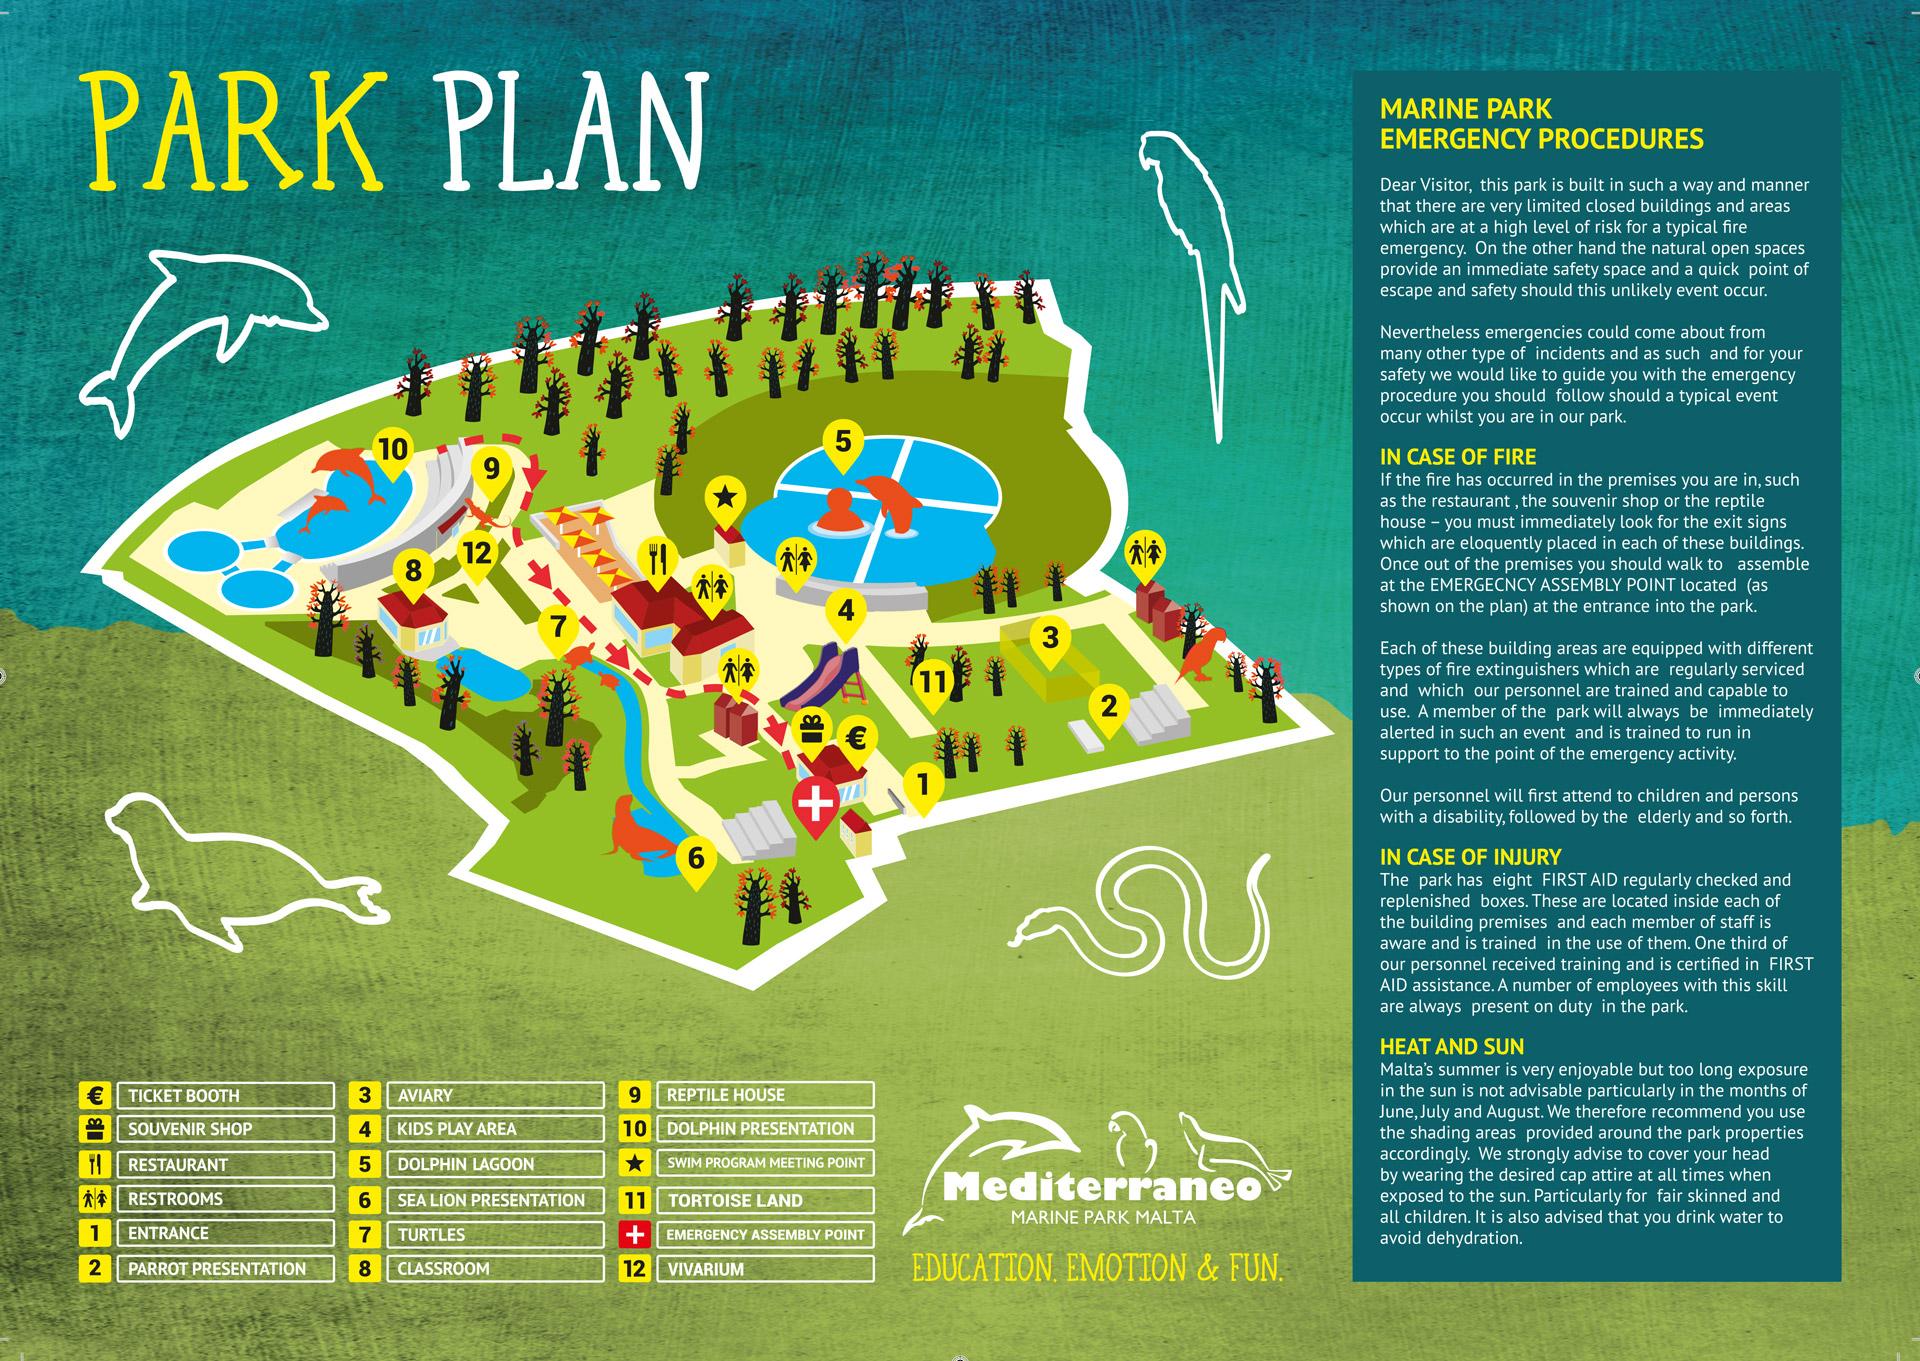 Mediterraneo Marine Park Malta Plan/Map